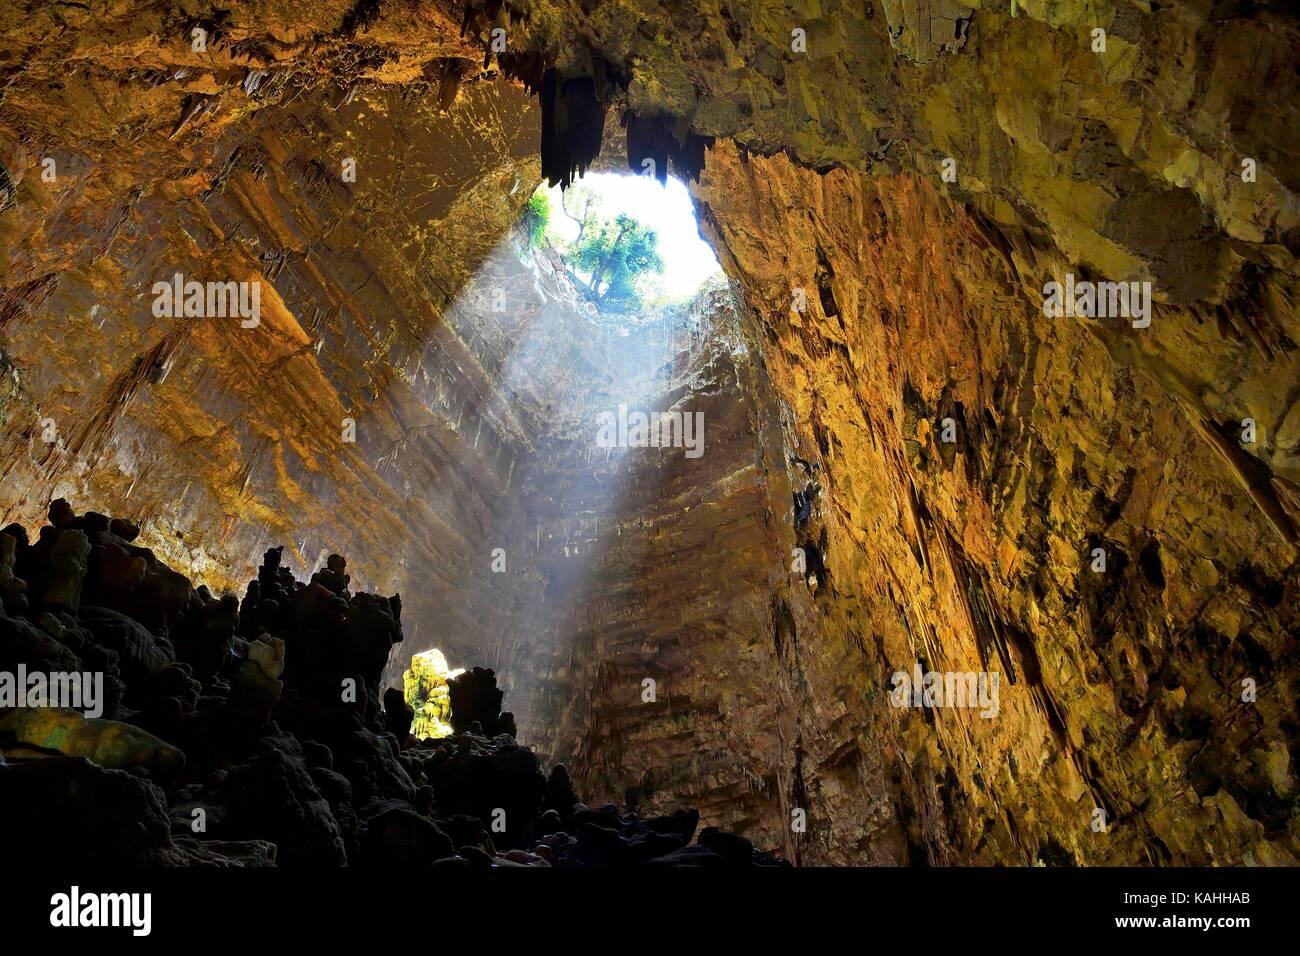 Light cone in the entrance area of the cave of Castellana Cave, Castellana Grotto, Province of Bari, Puglia, Italy - Stock Image